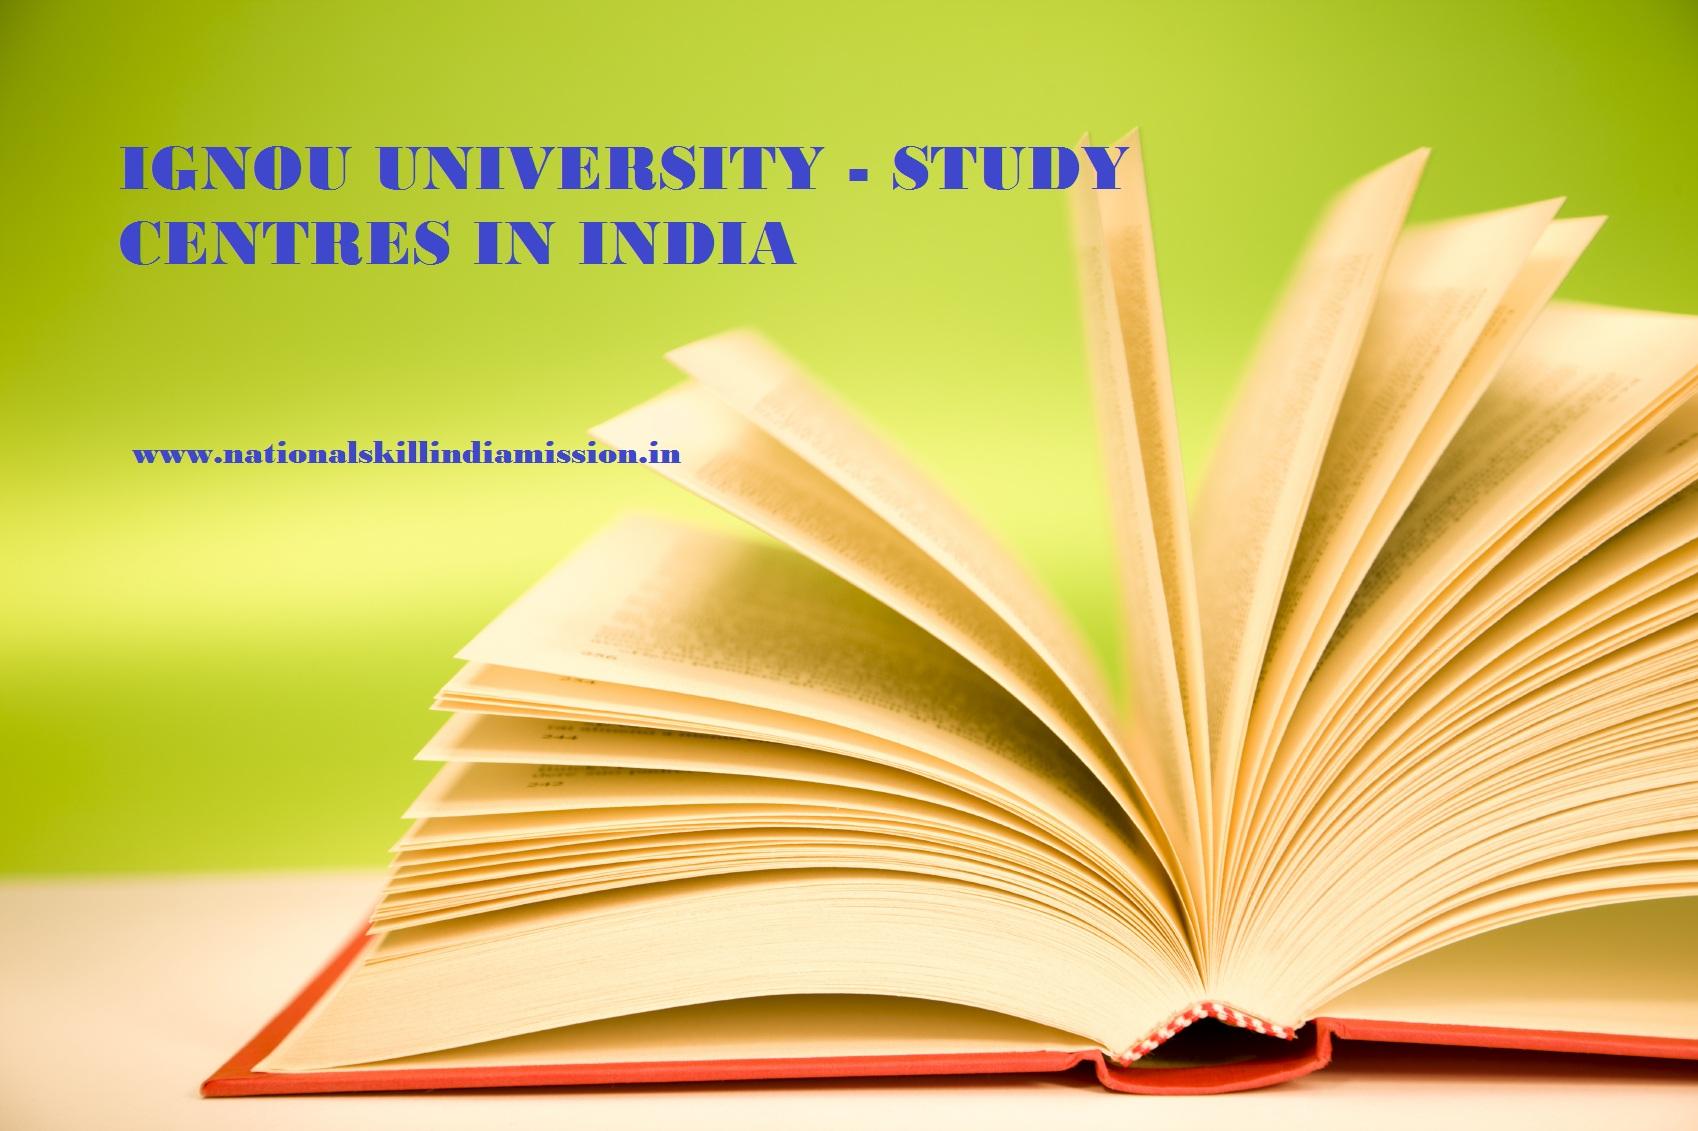 IGNOU University - Regional Centres in India